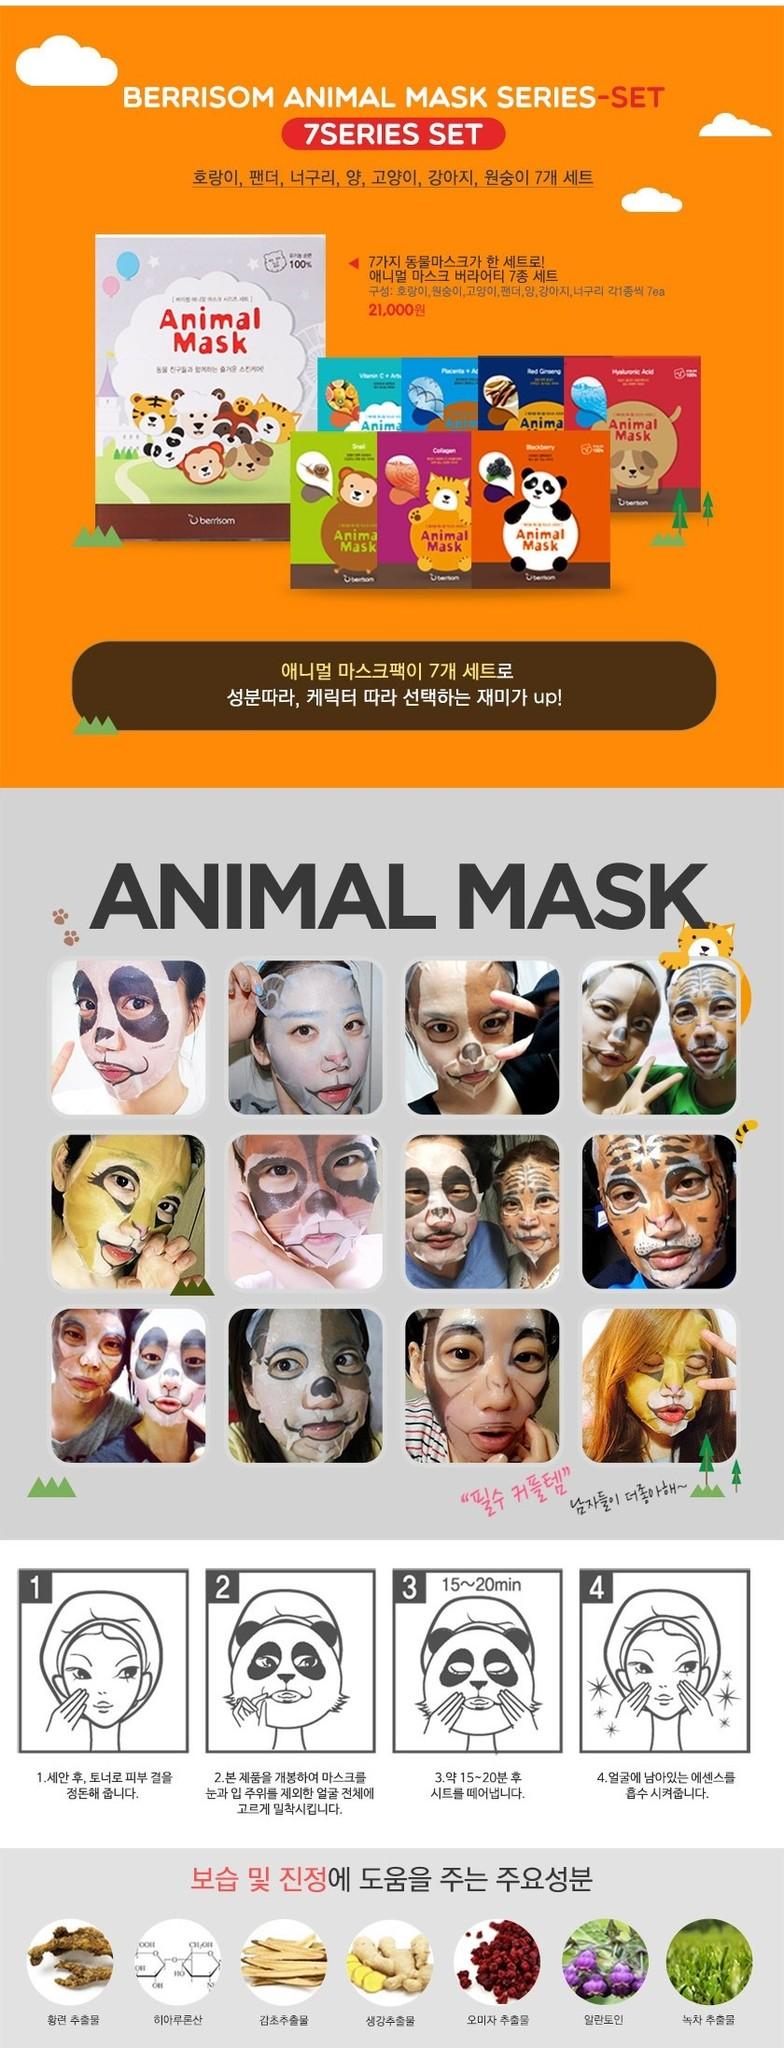 Animal Mask Series - Monkey-6